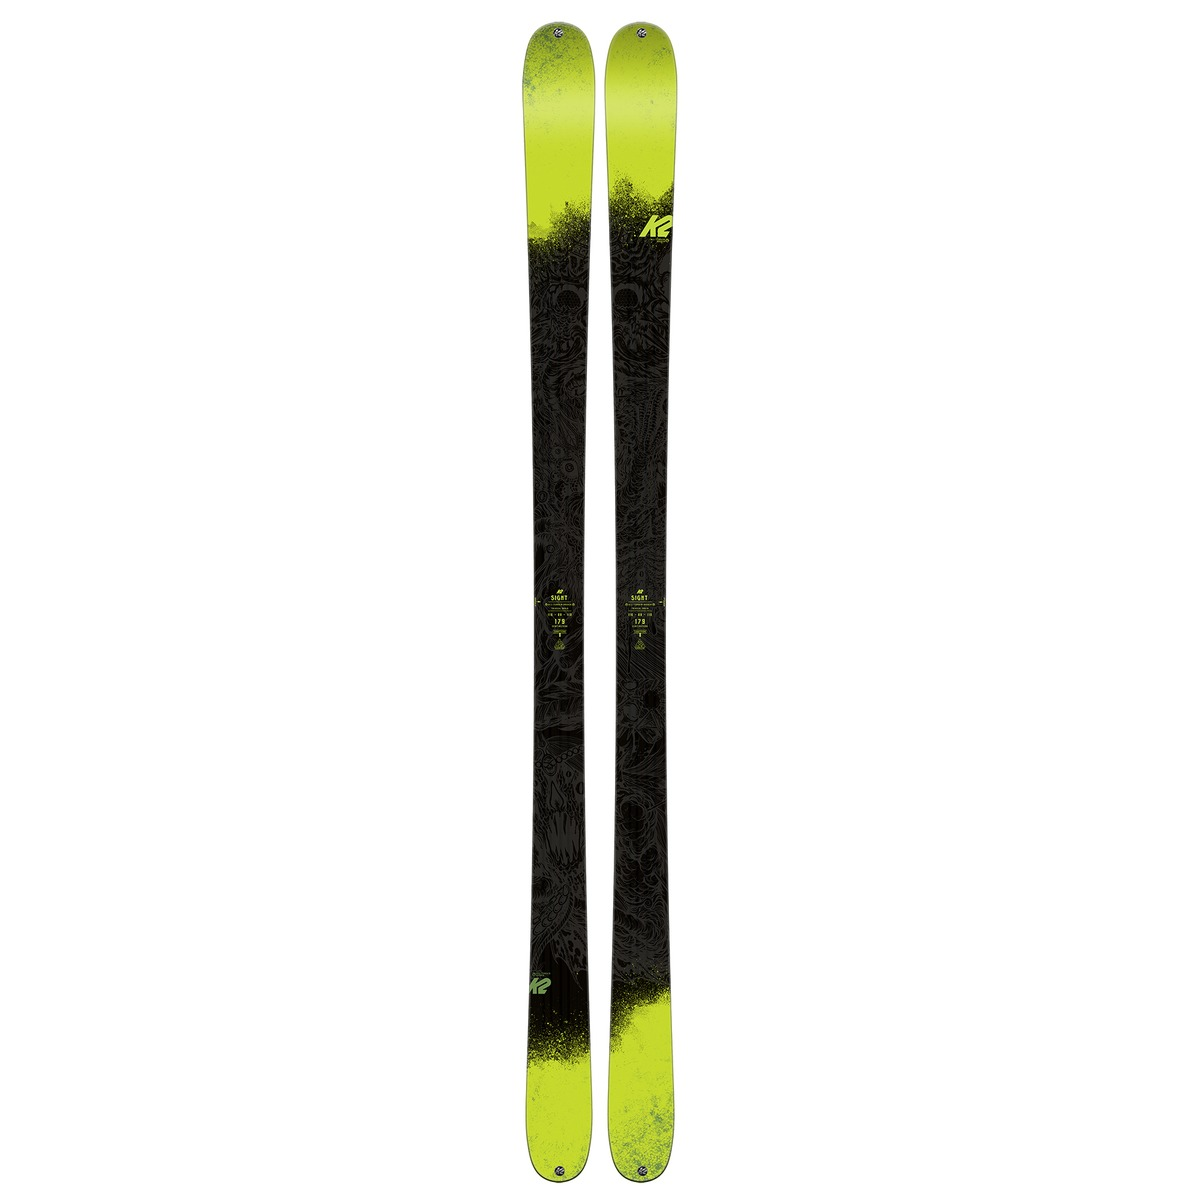 K2 Skis Sight 17/18, Twintip-Ski, Unisex -